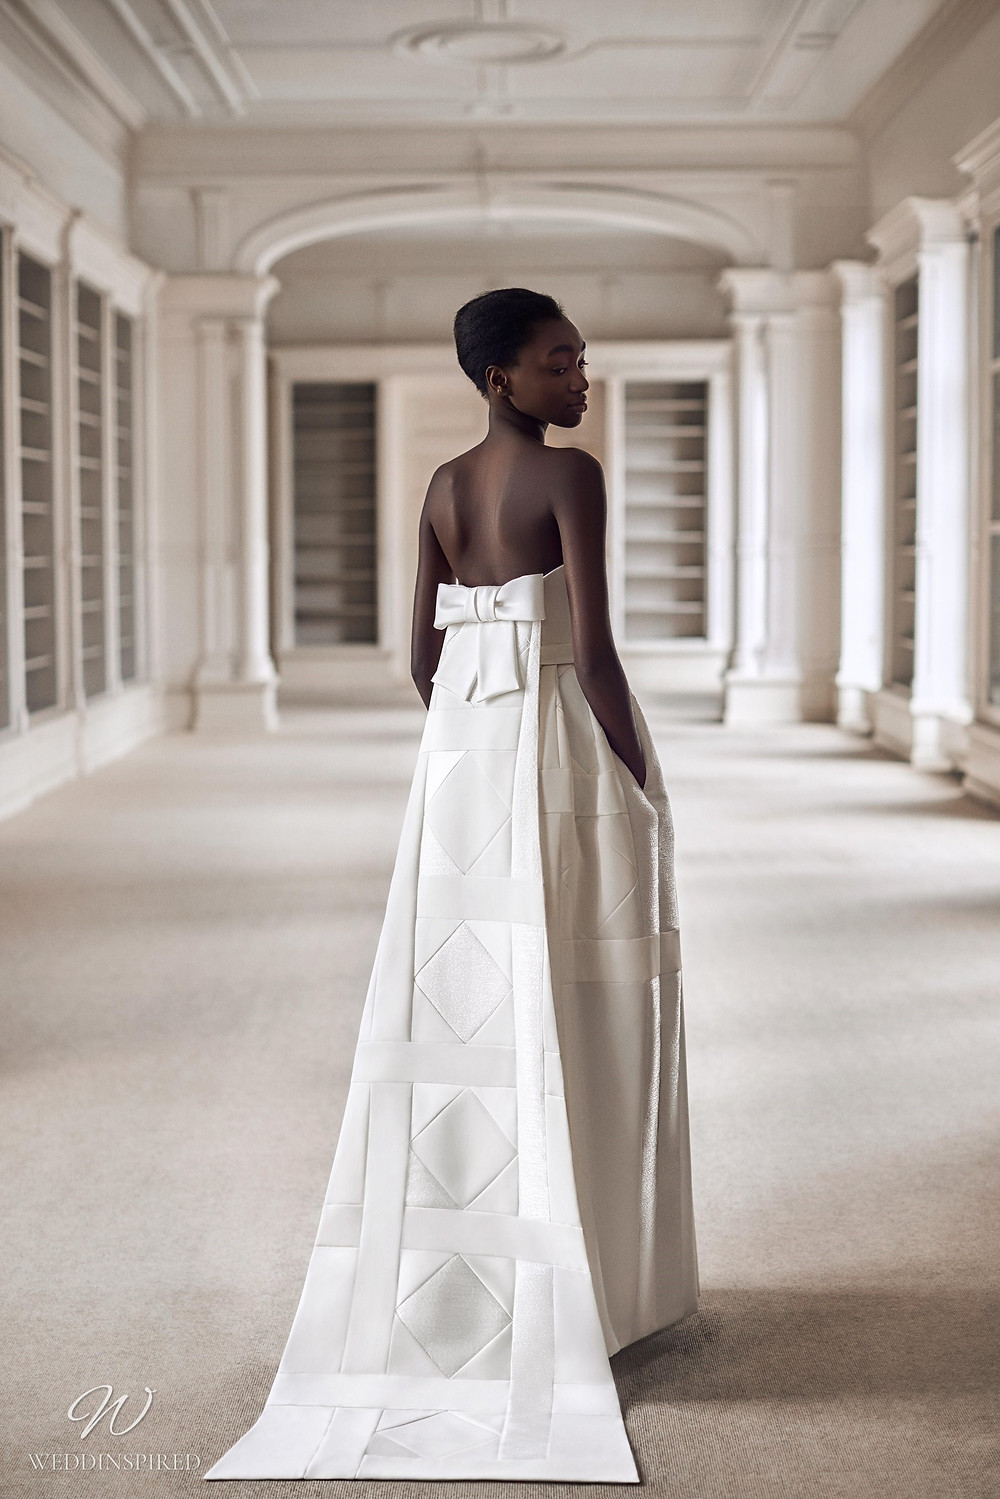 A Viktor & Rolf 2021 sheath wedding dress with a bow and geometric patterns